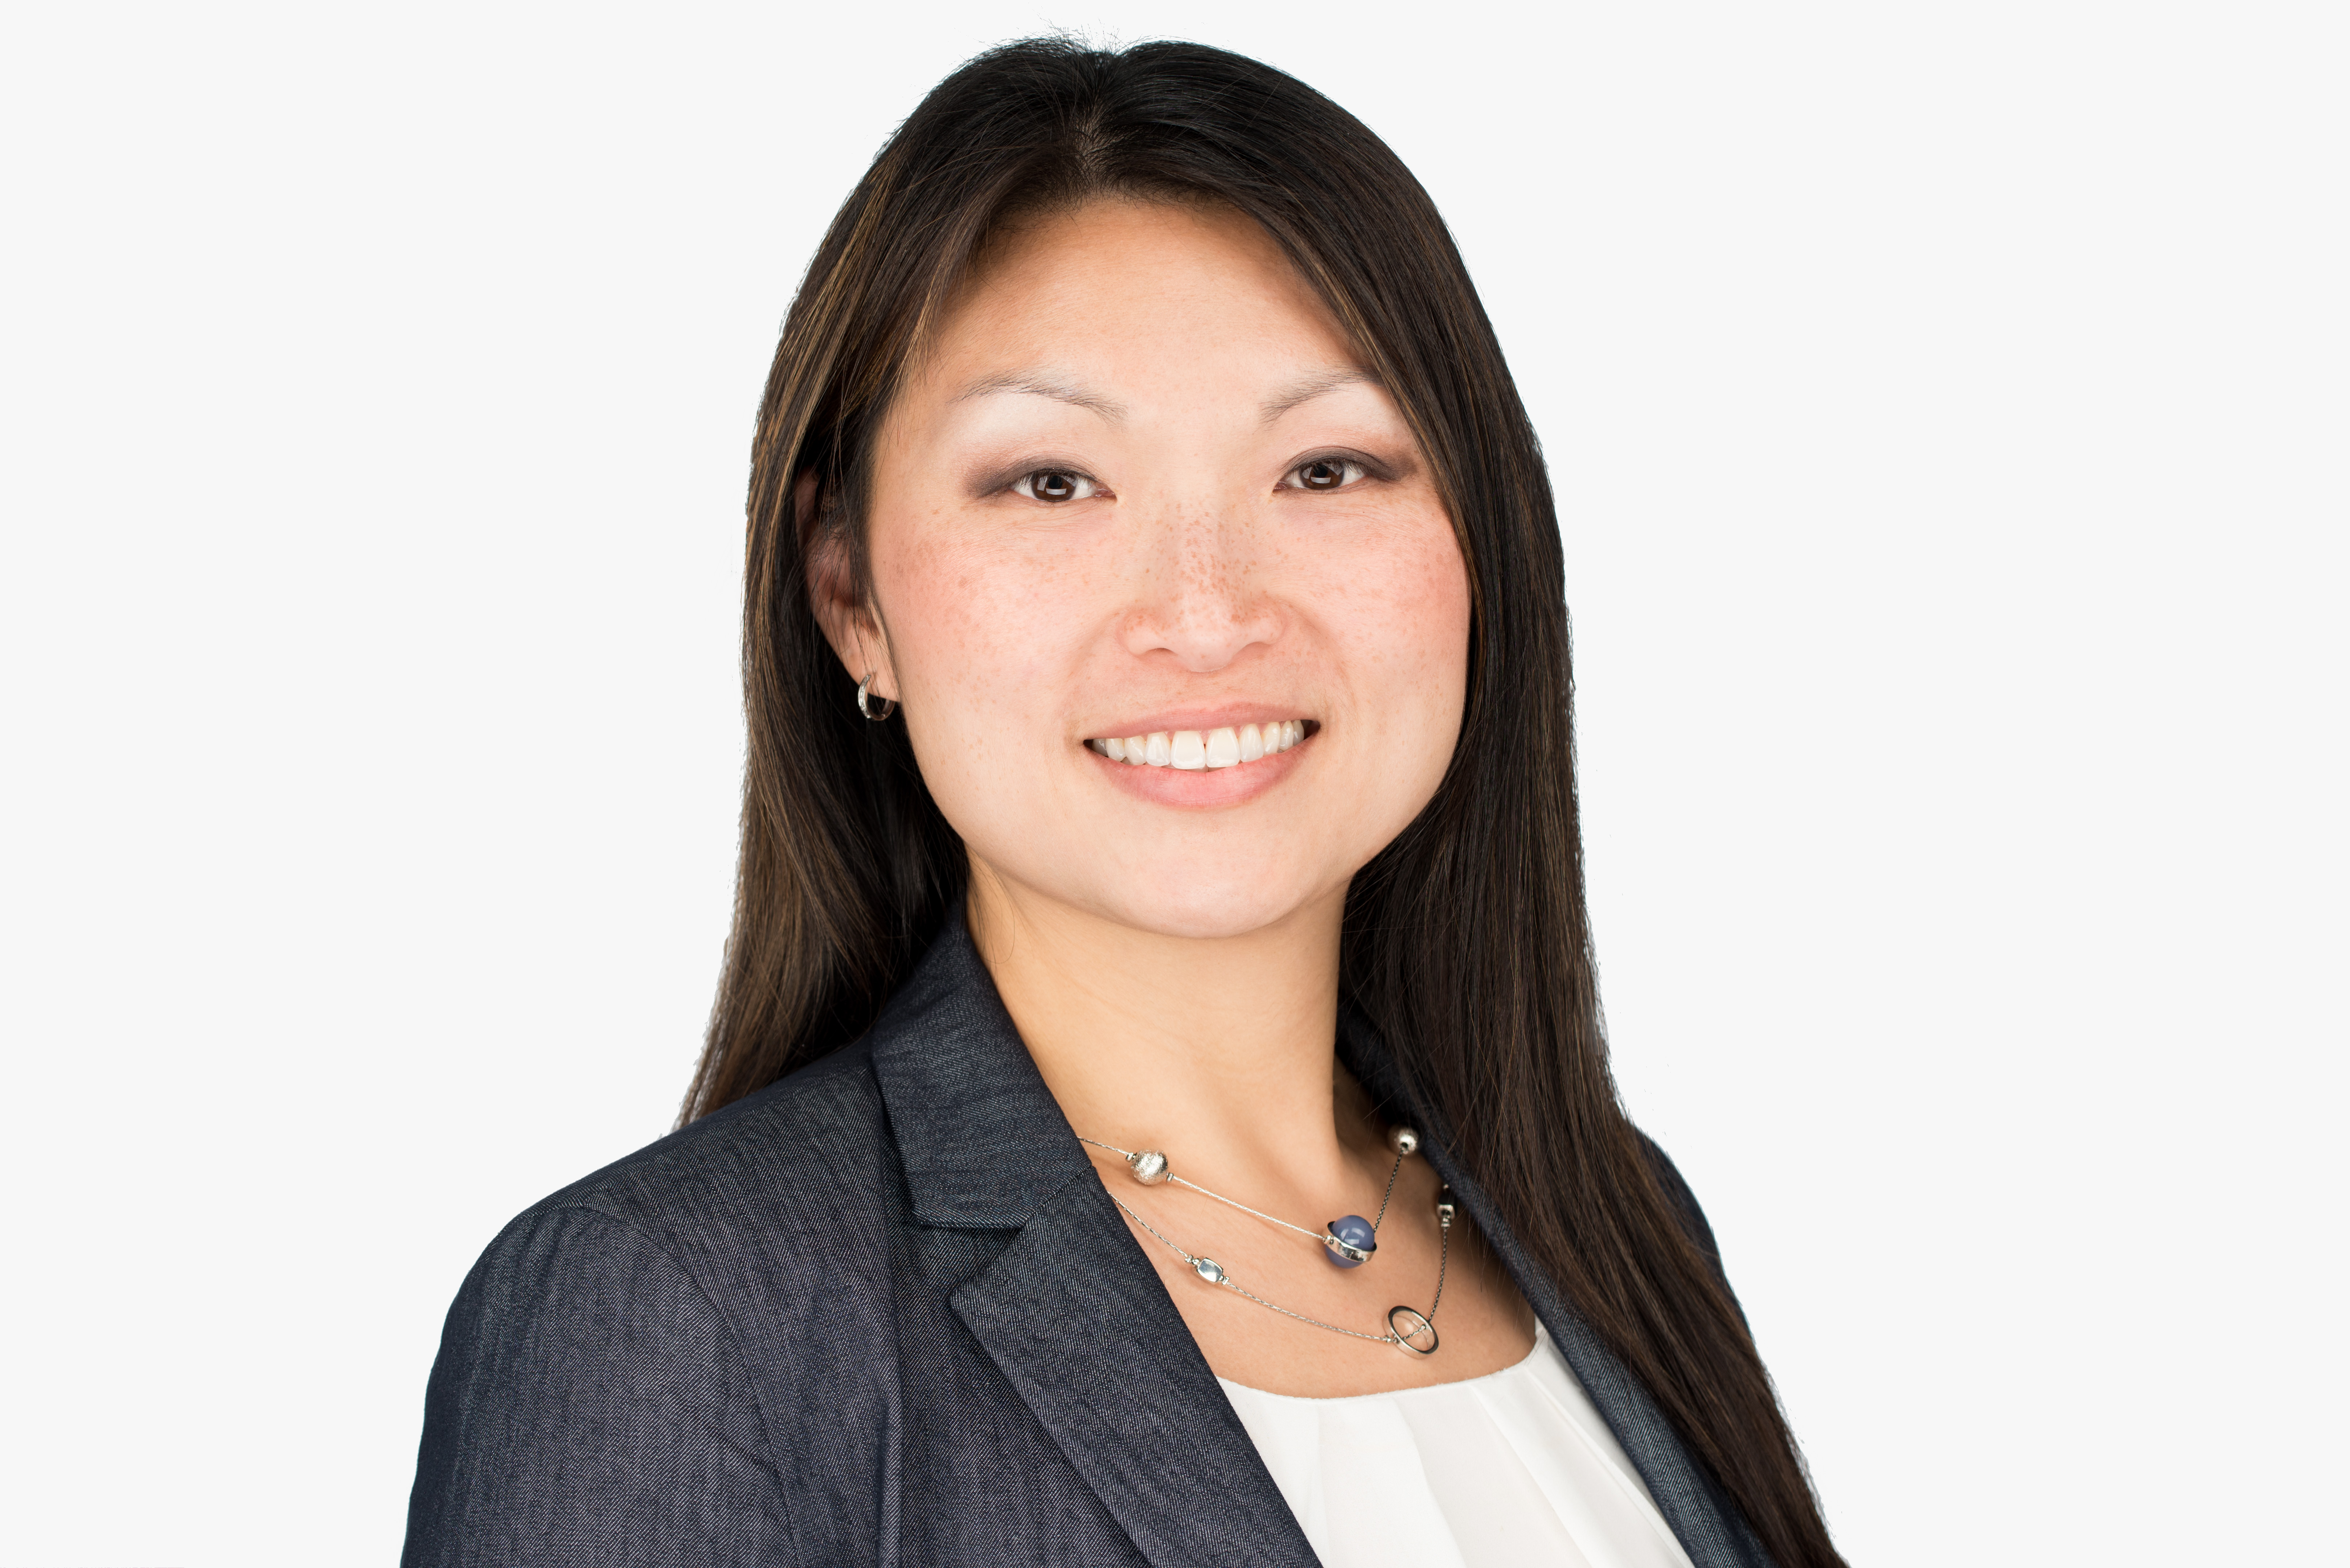 Alison Chin